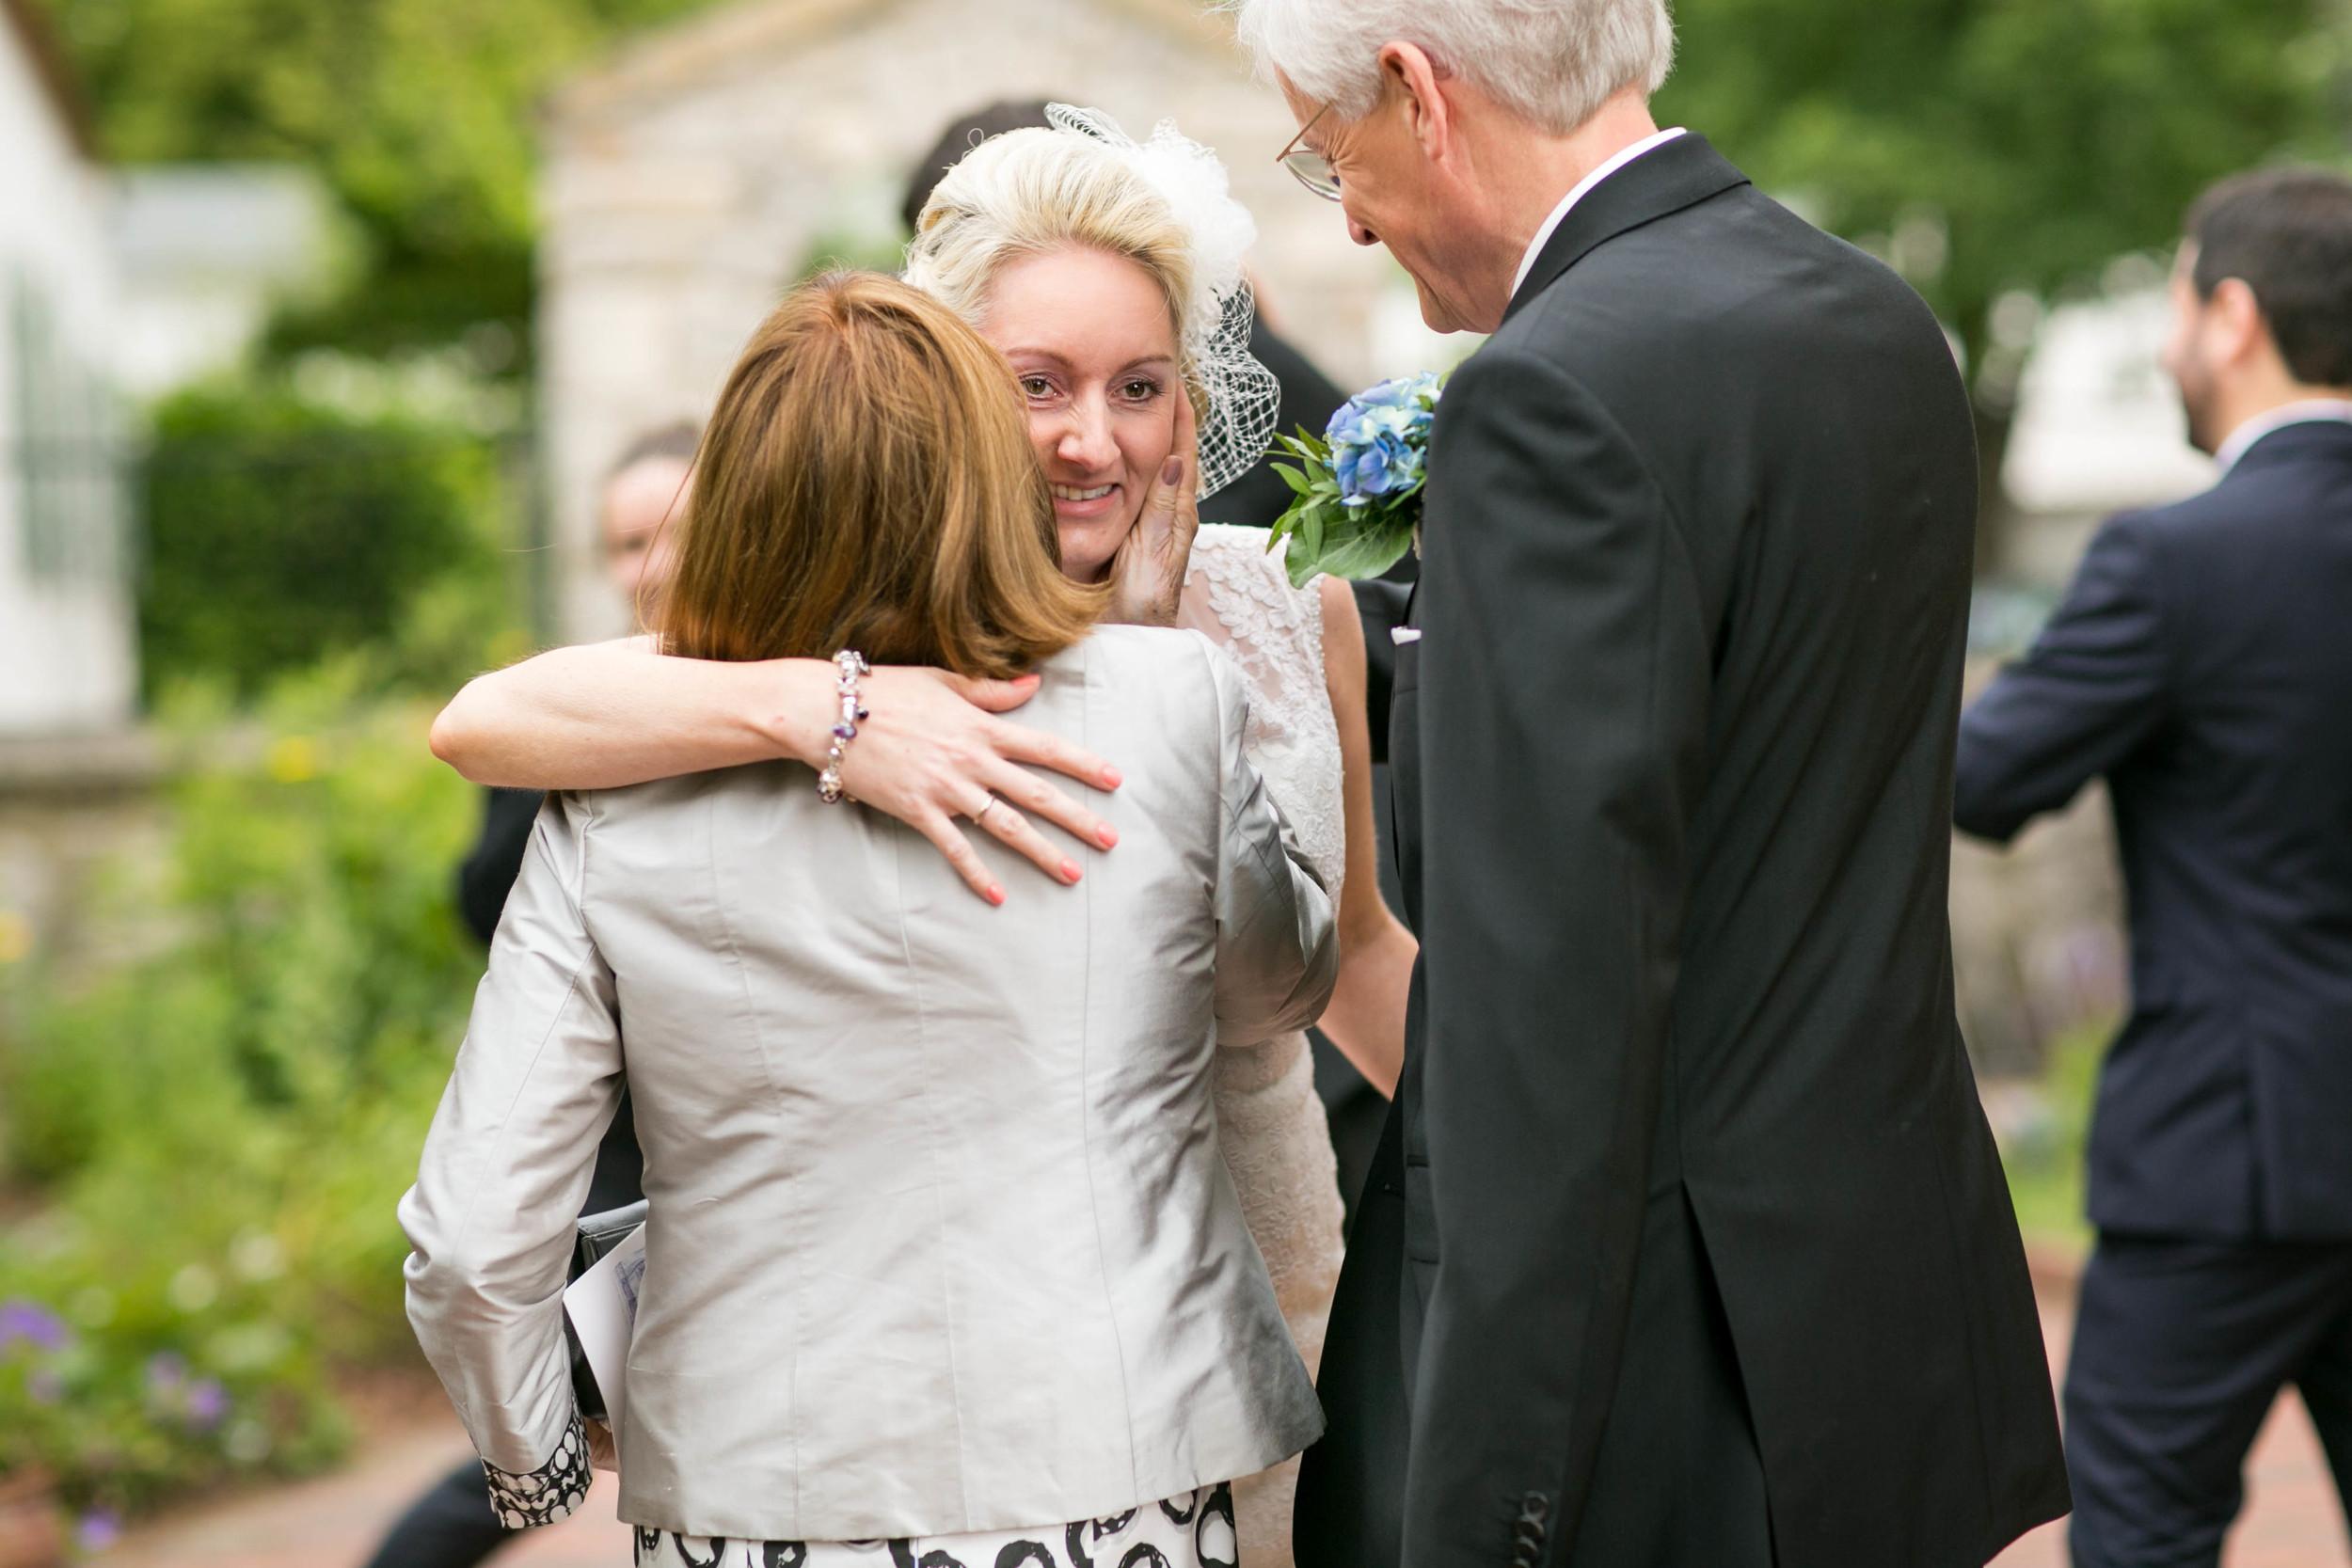 Hochzeitsfotografie Berlin_Fran Burrows Fotografie_18.jpg